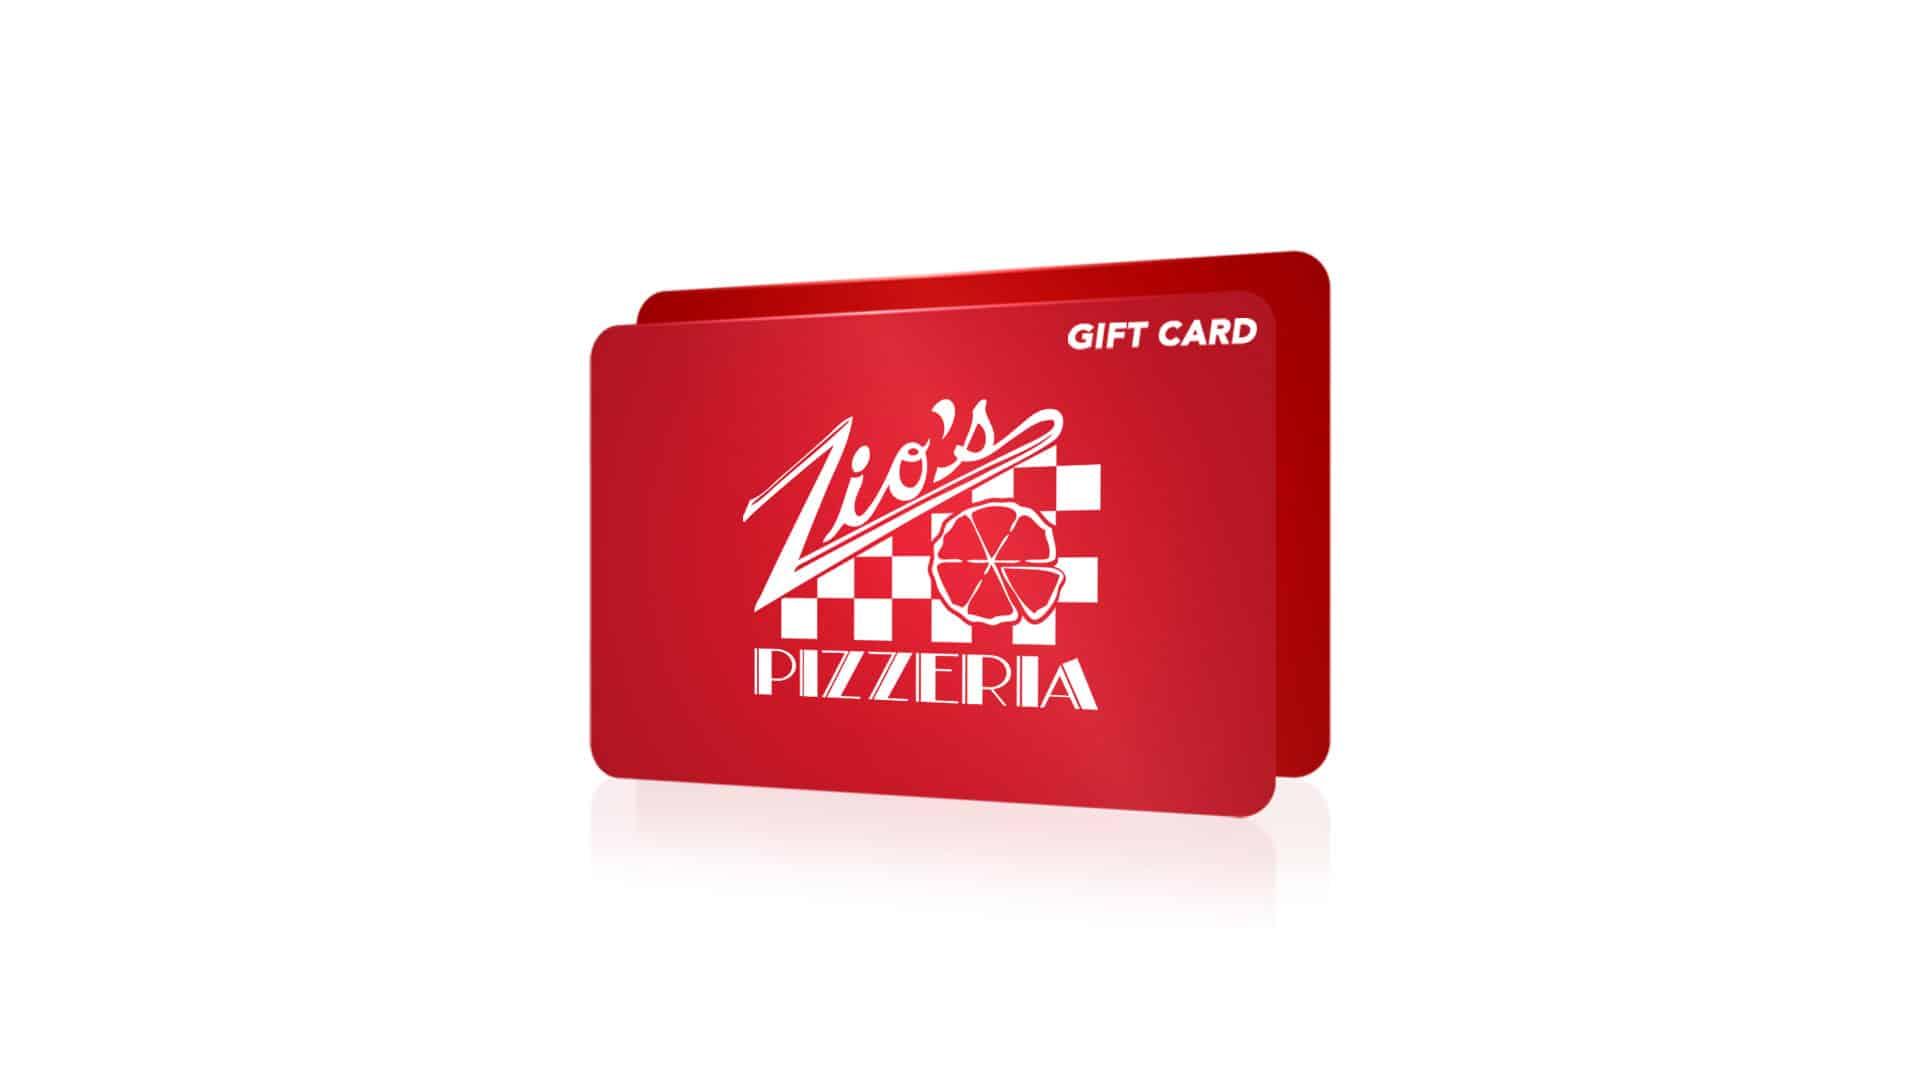 GIFT CARDS - Zio's Pizzeria